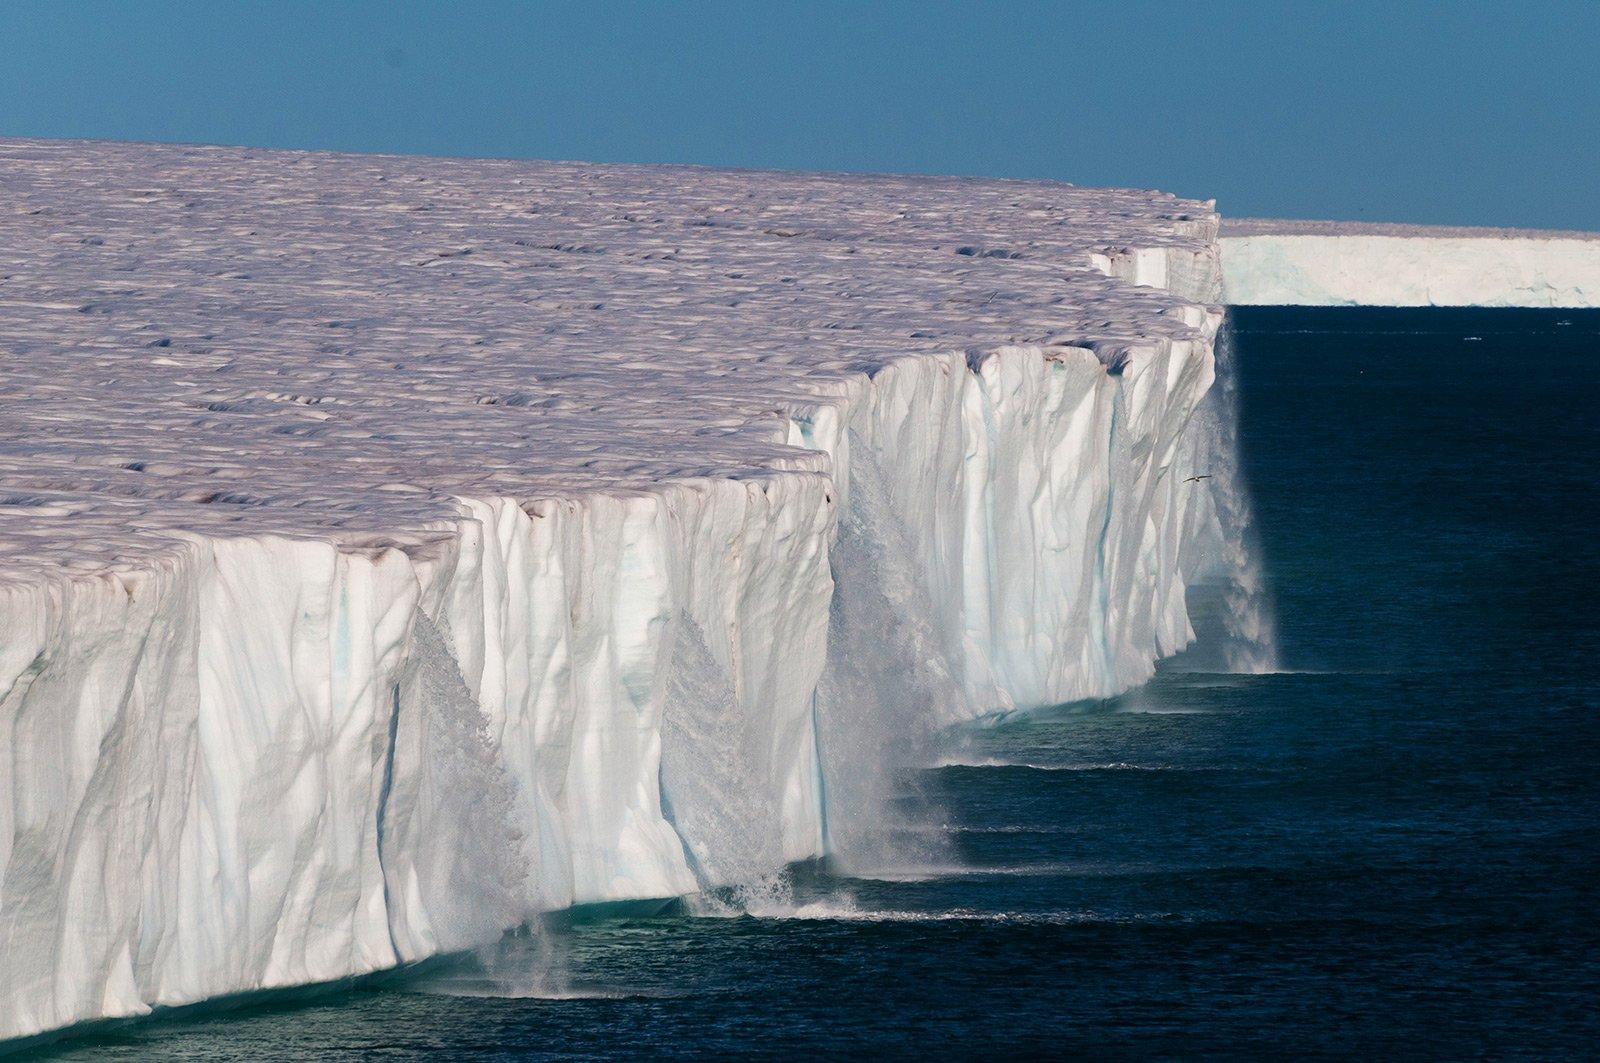 Austfonna Ice Cap Spitsbergen